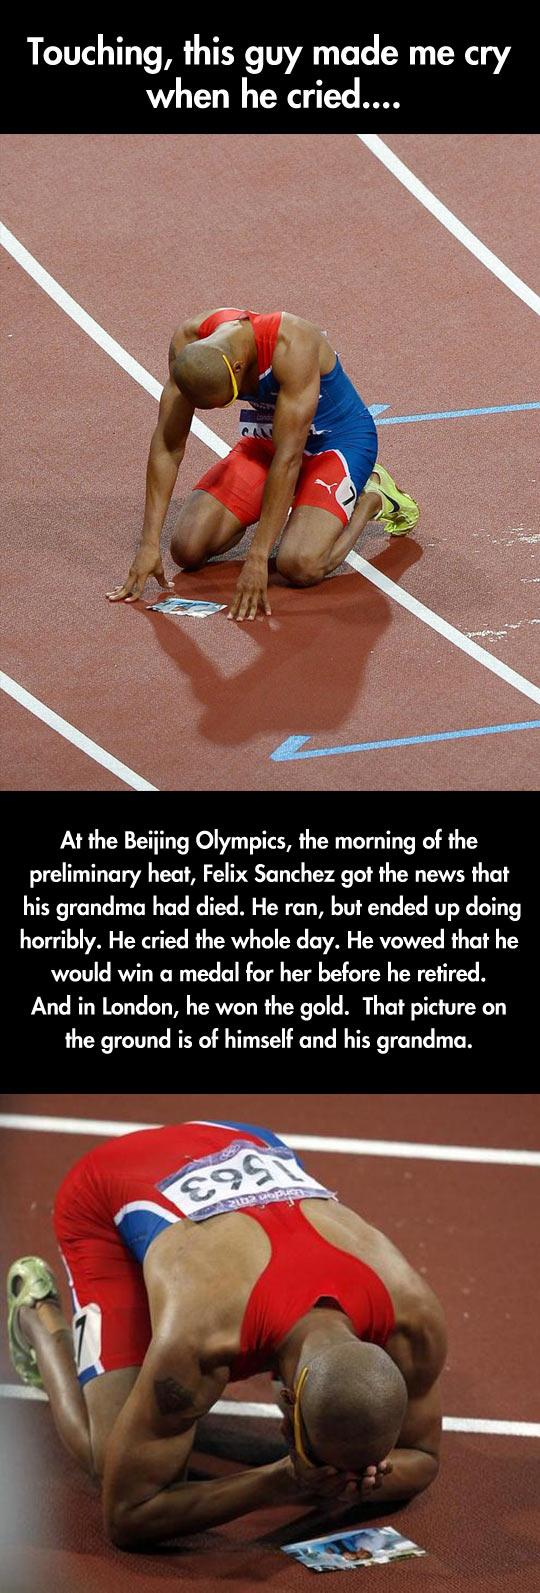 Beijing-Olympics-Felix-Sanchez